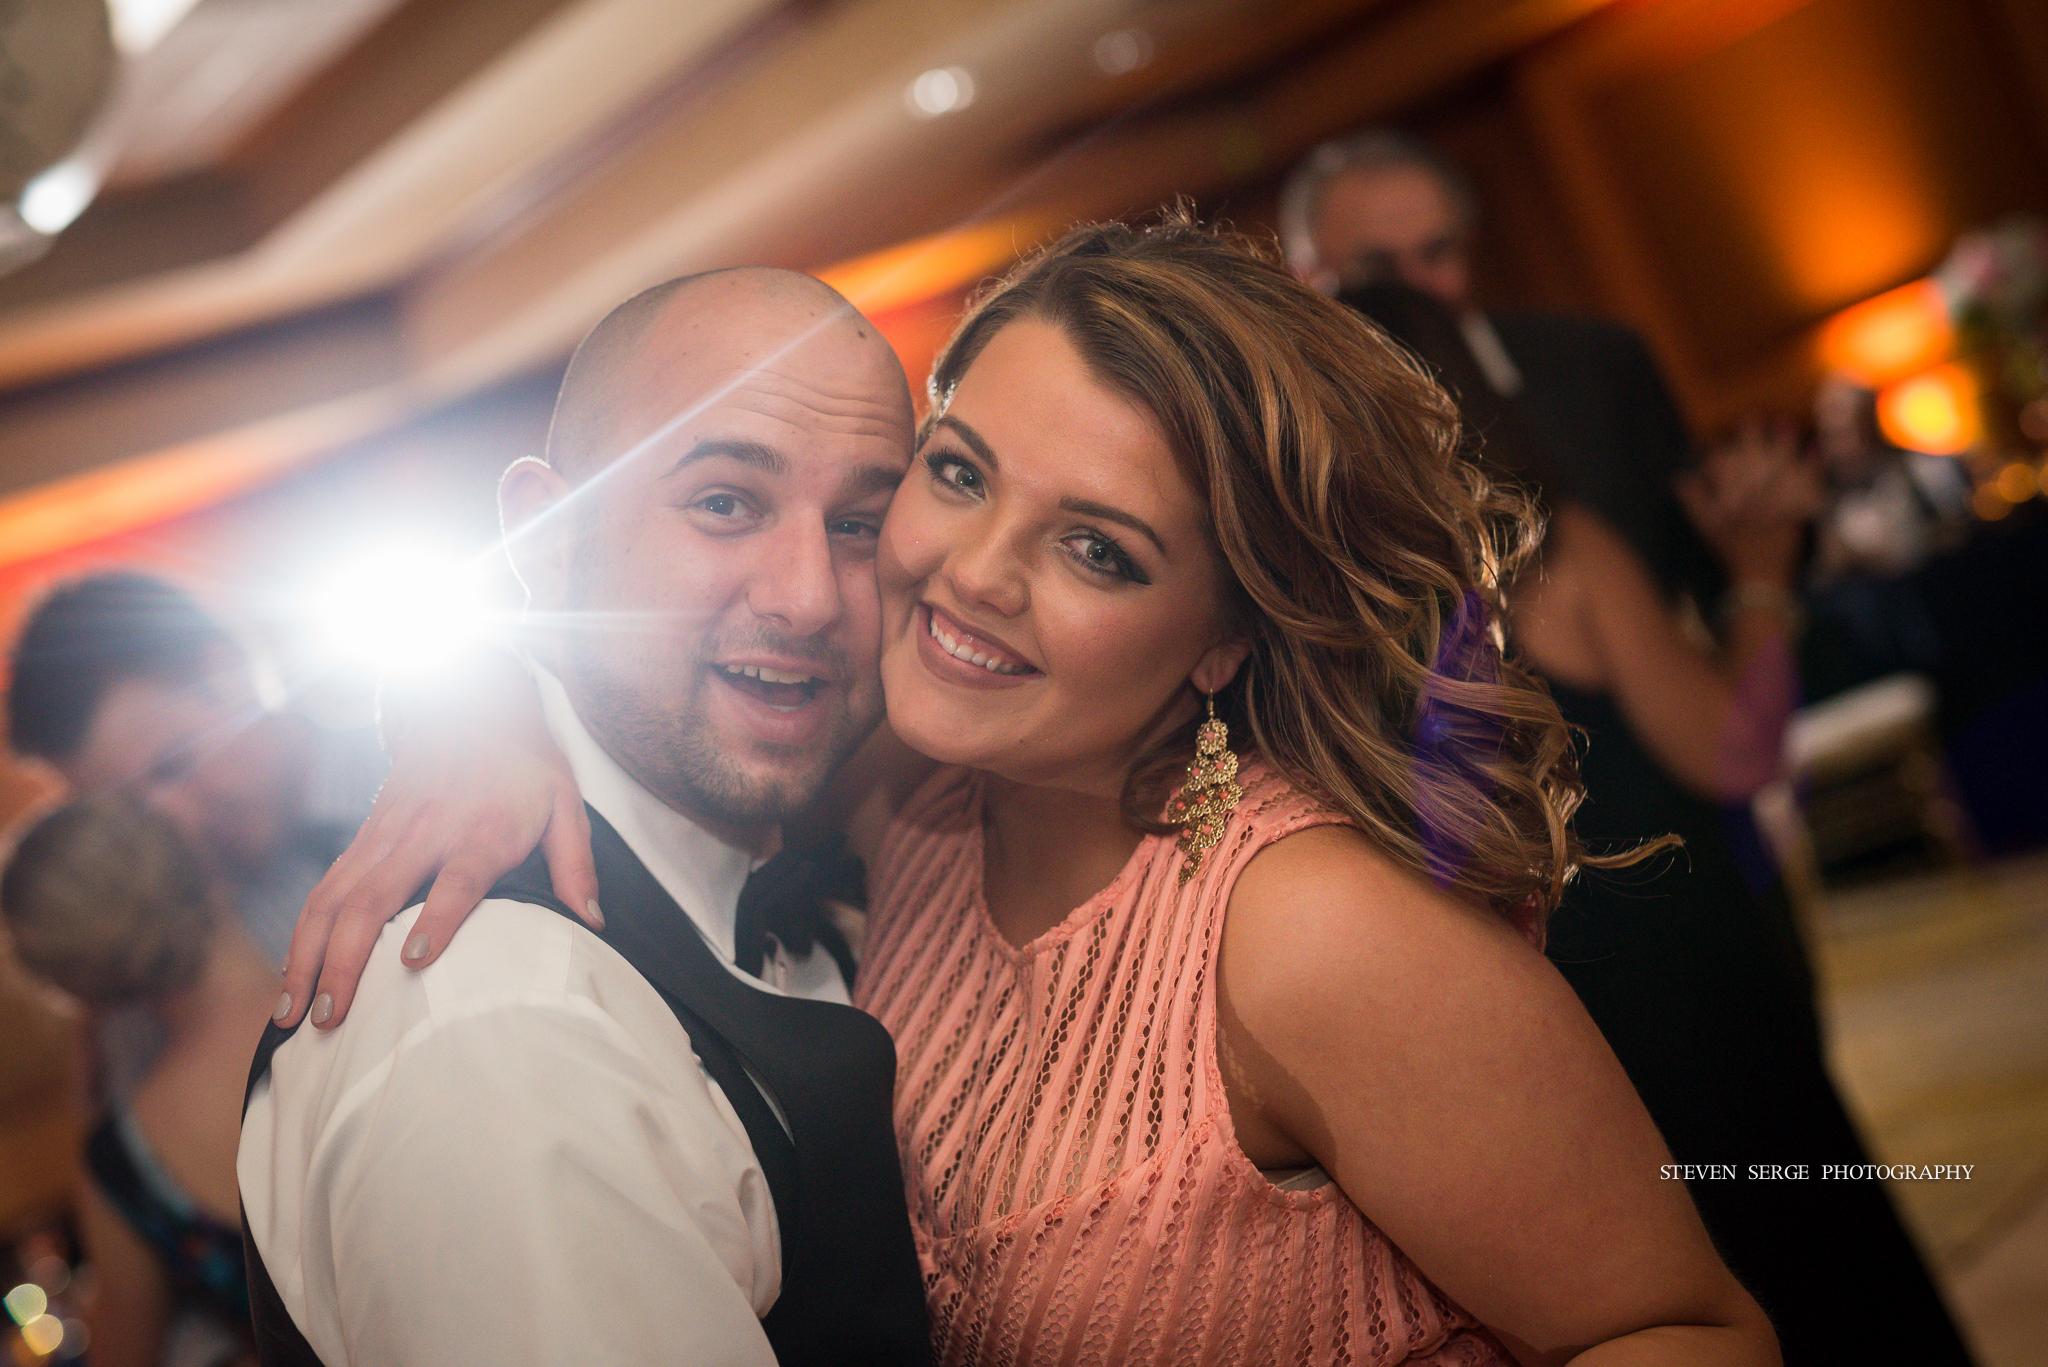 scranton-wedding-photographers-hilton-steven-serge-photography-35.jpg